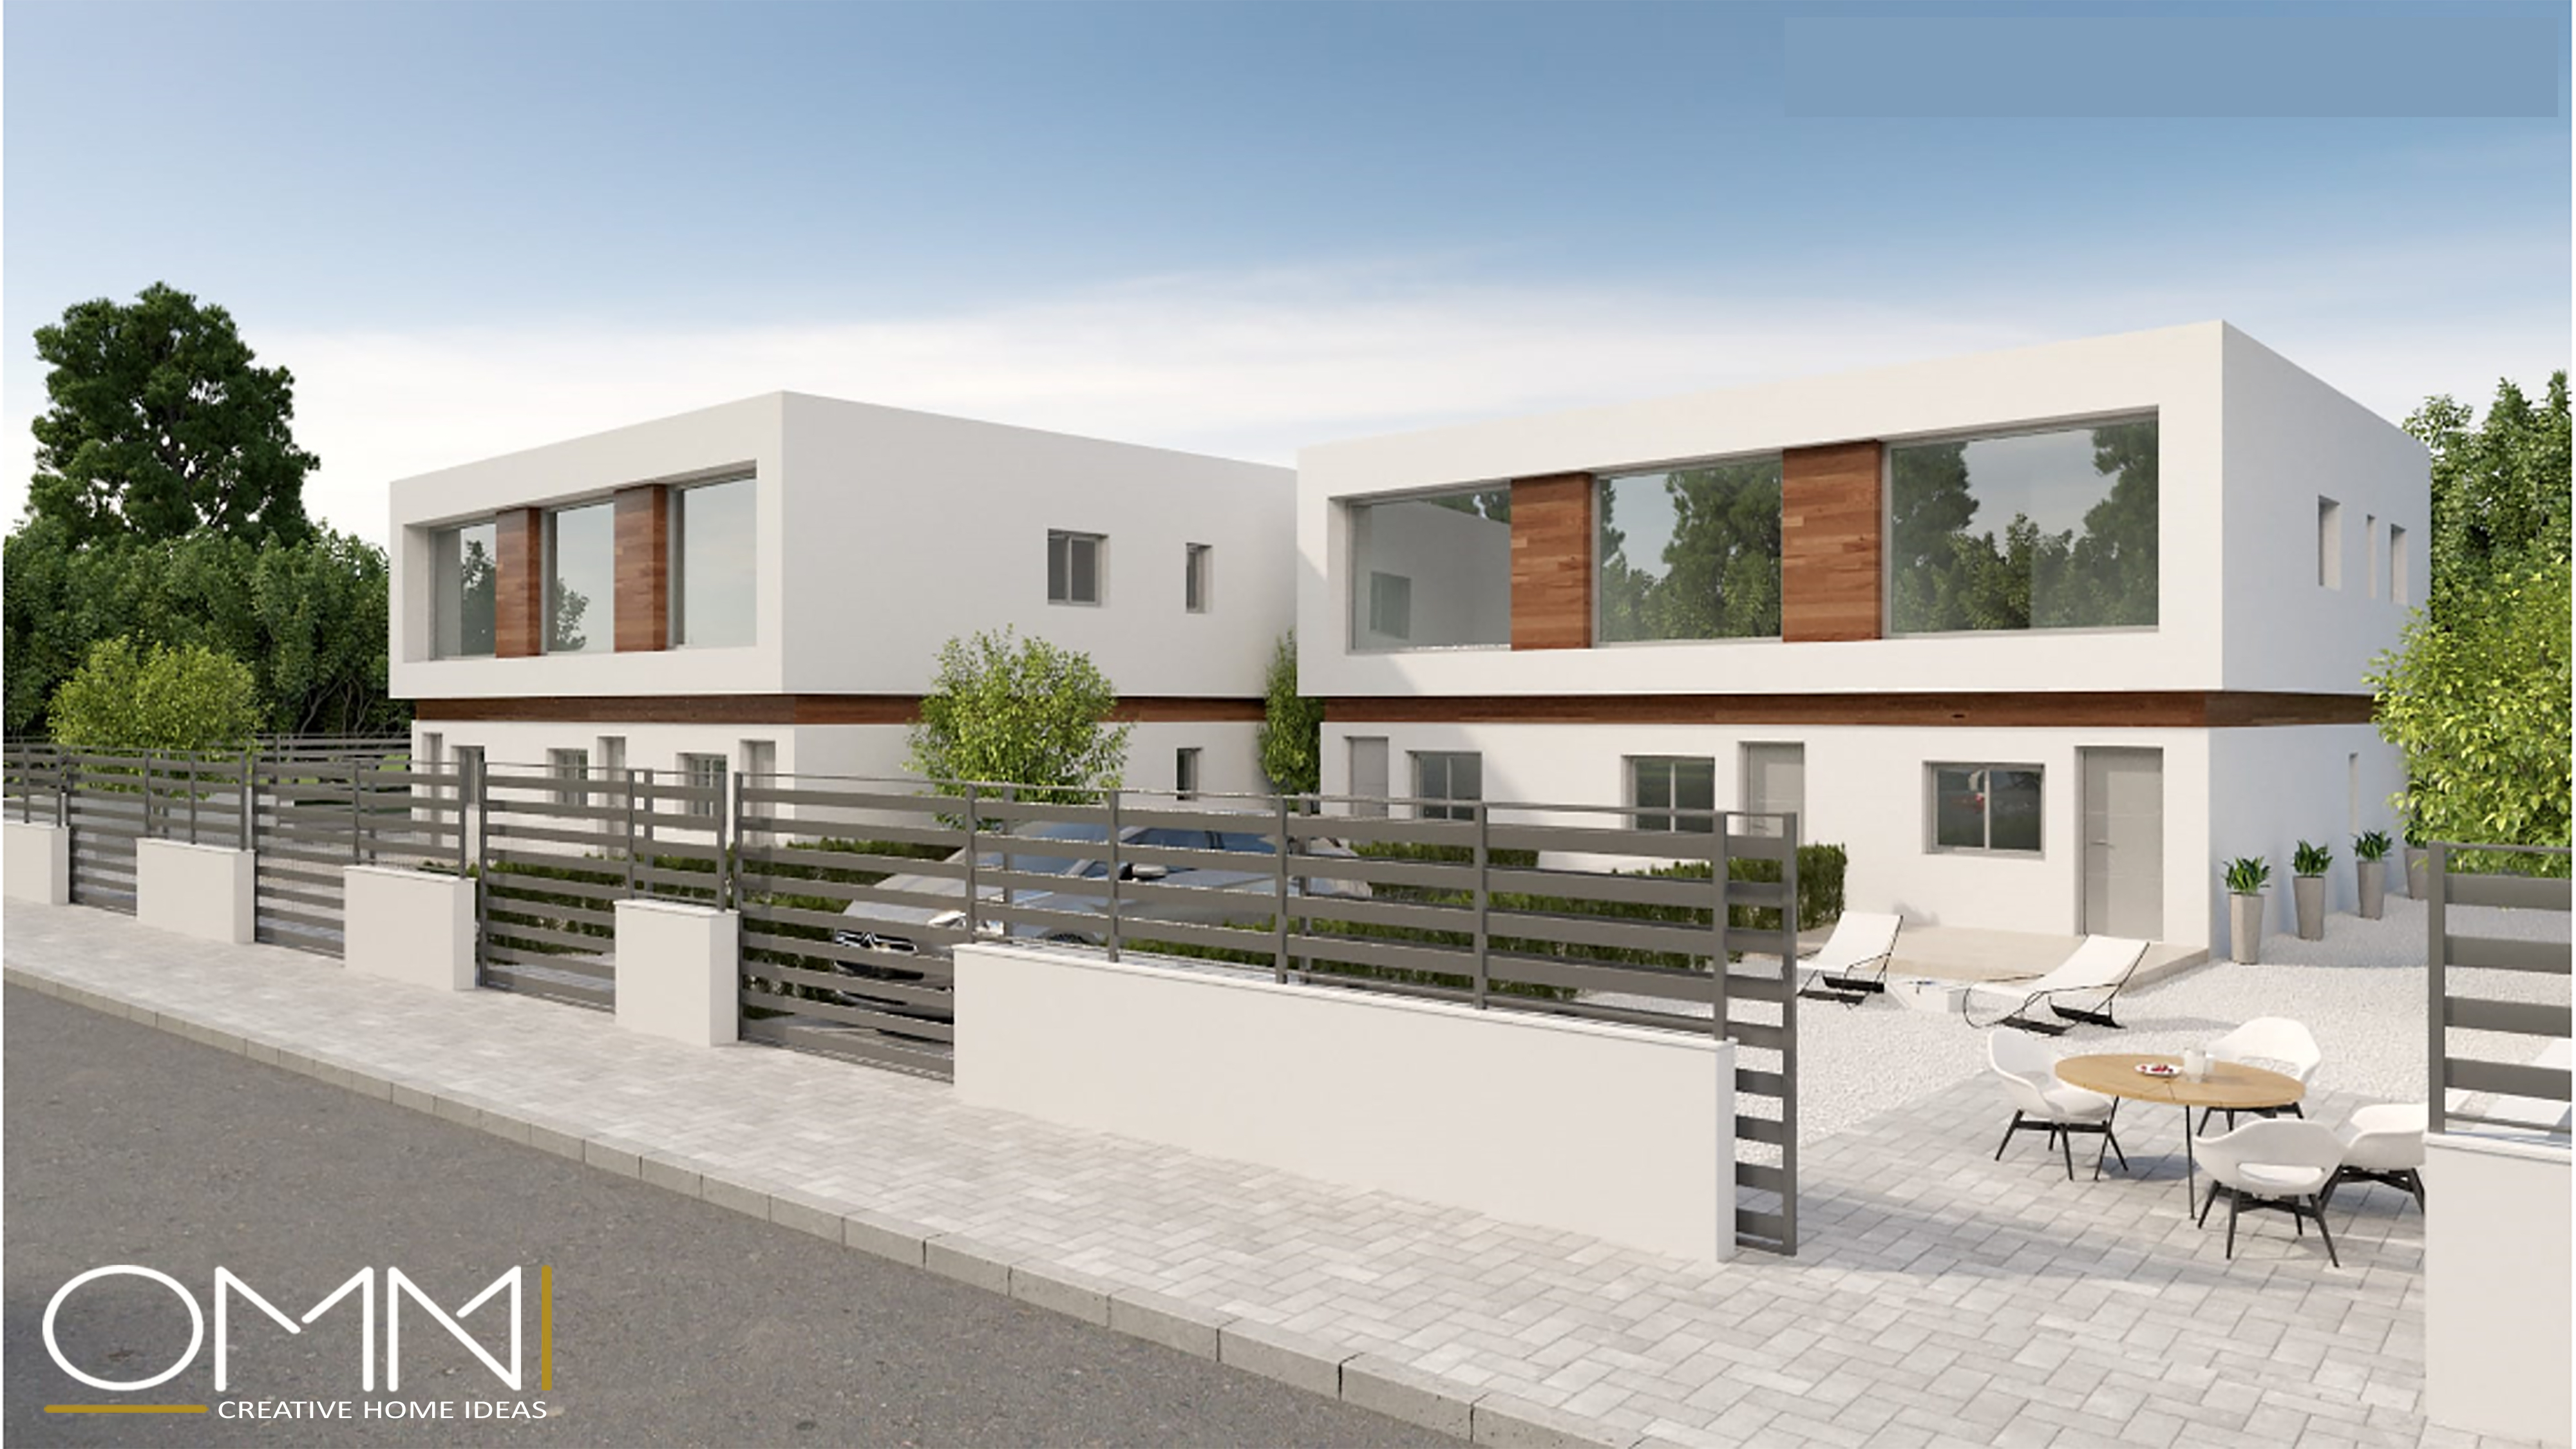 kf943651: Townhouse for sale in Villamartin